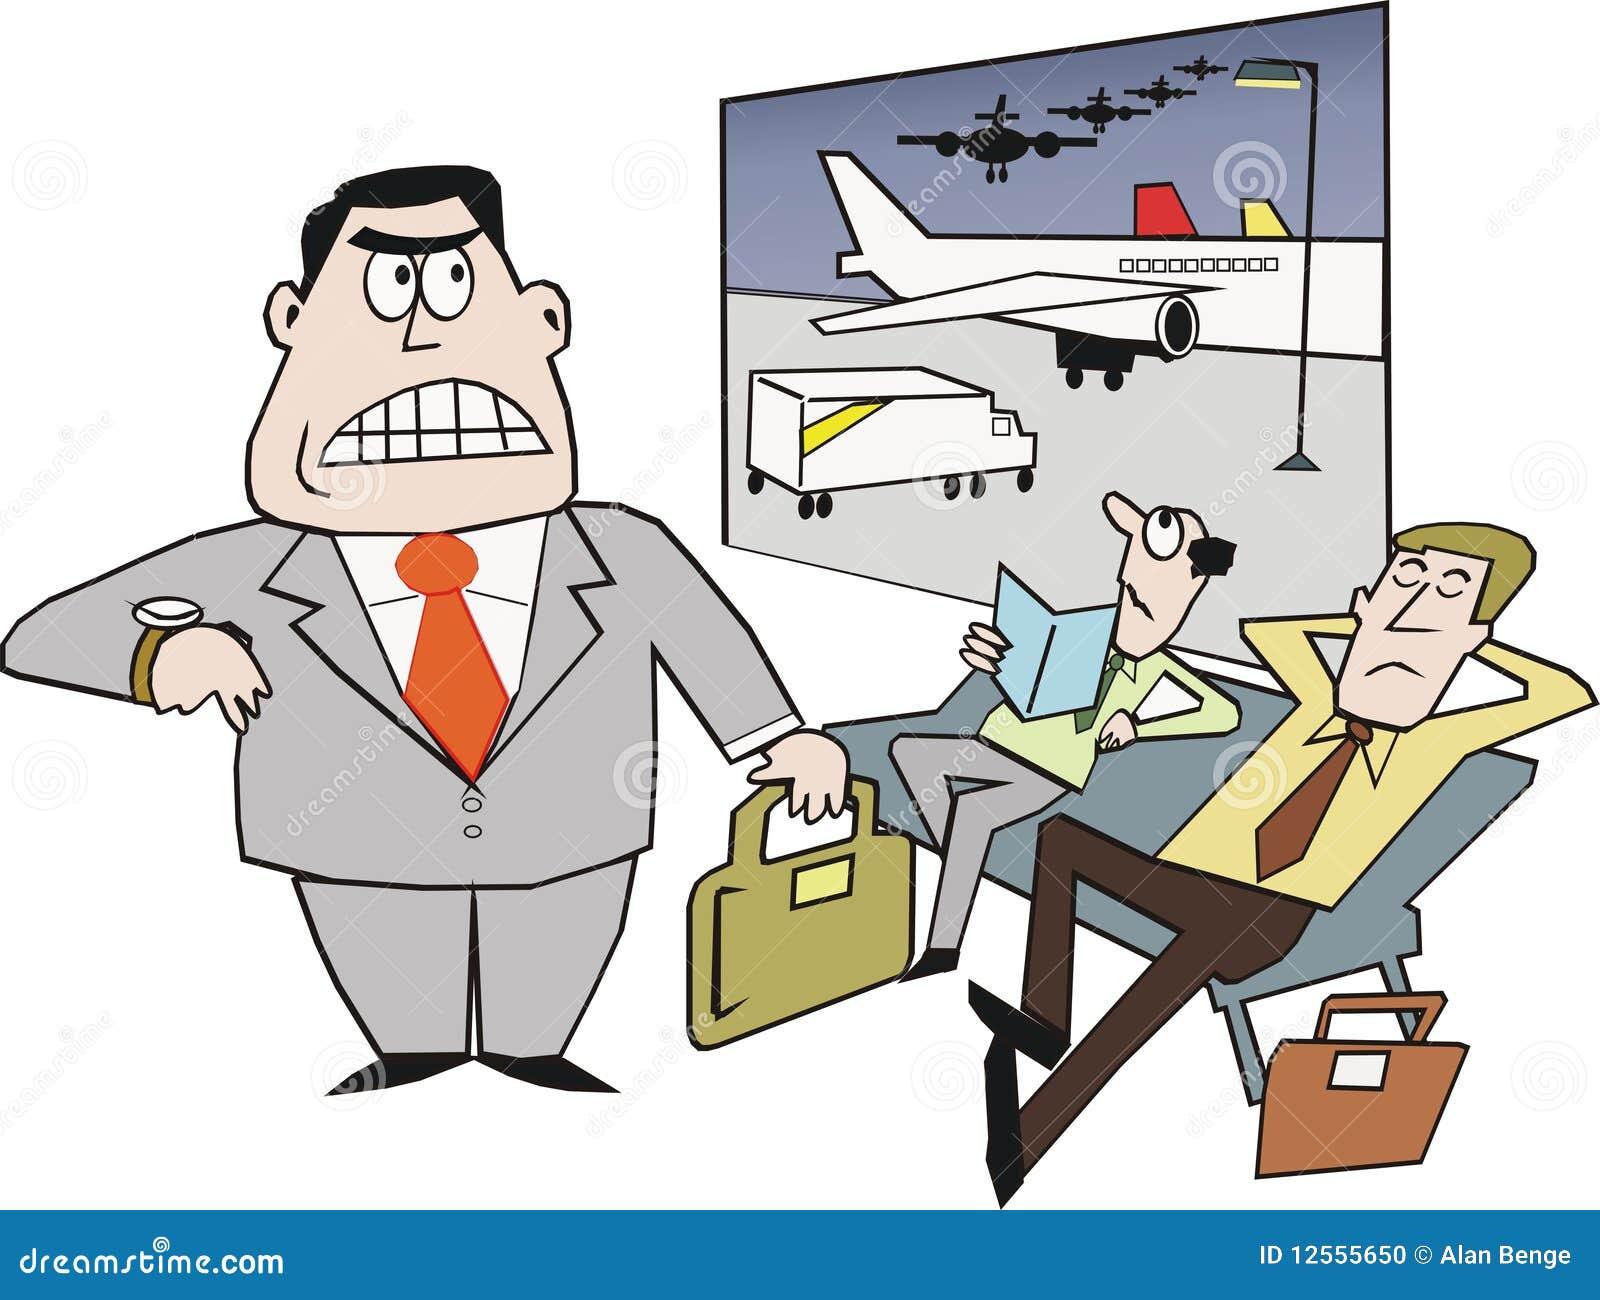 Airport delay cartoon ... Airport Cartoon Images